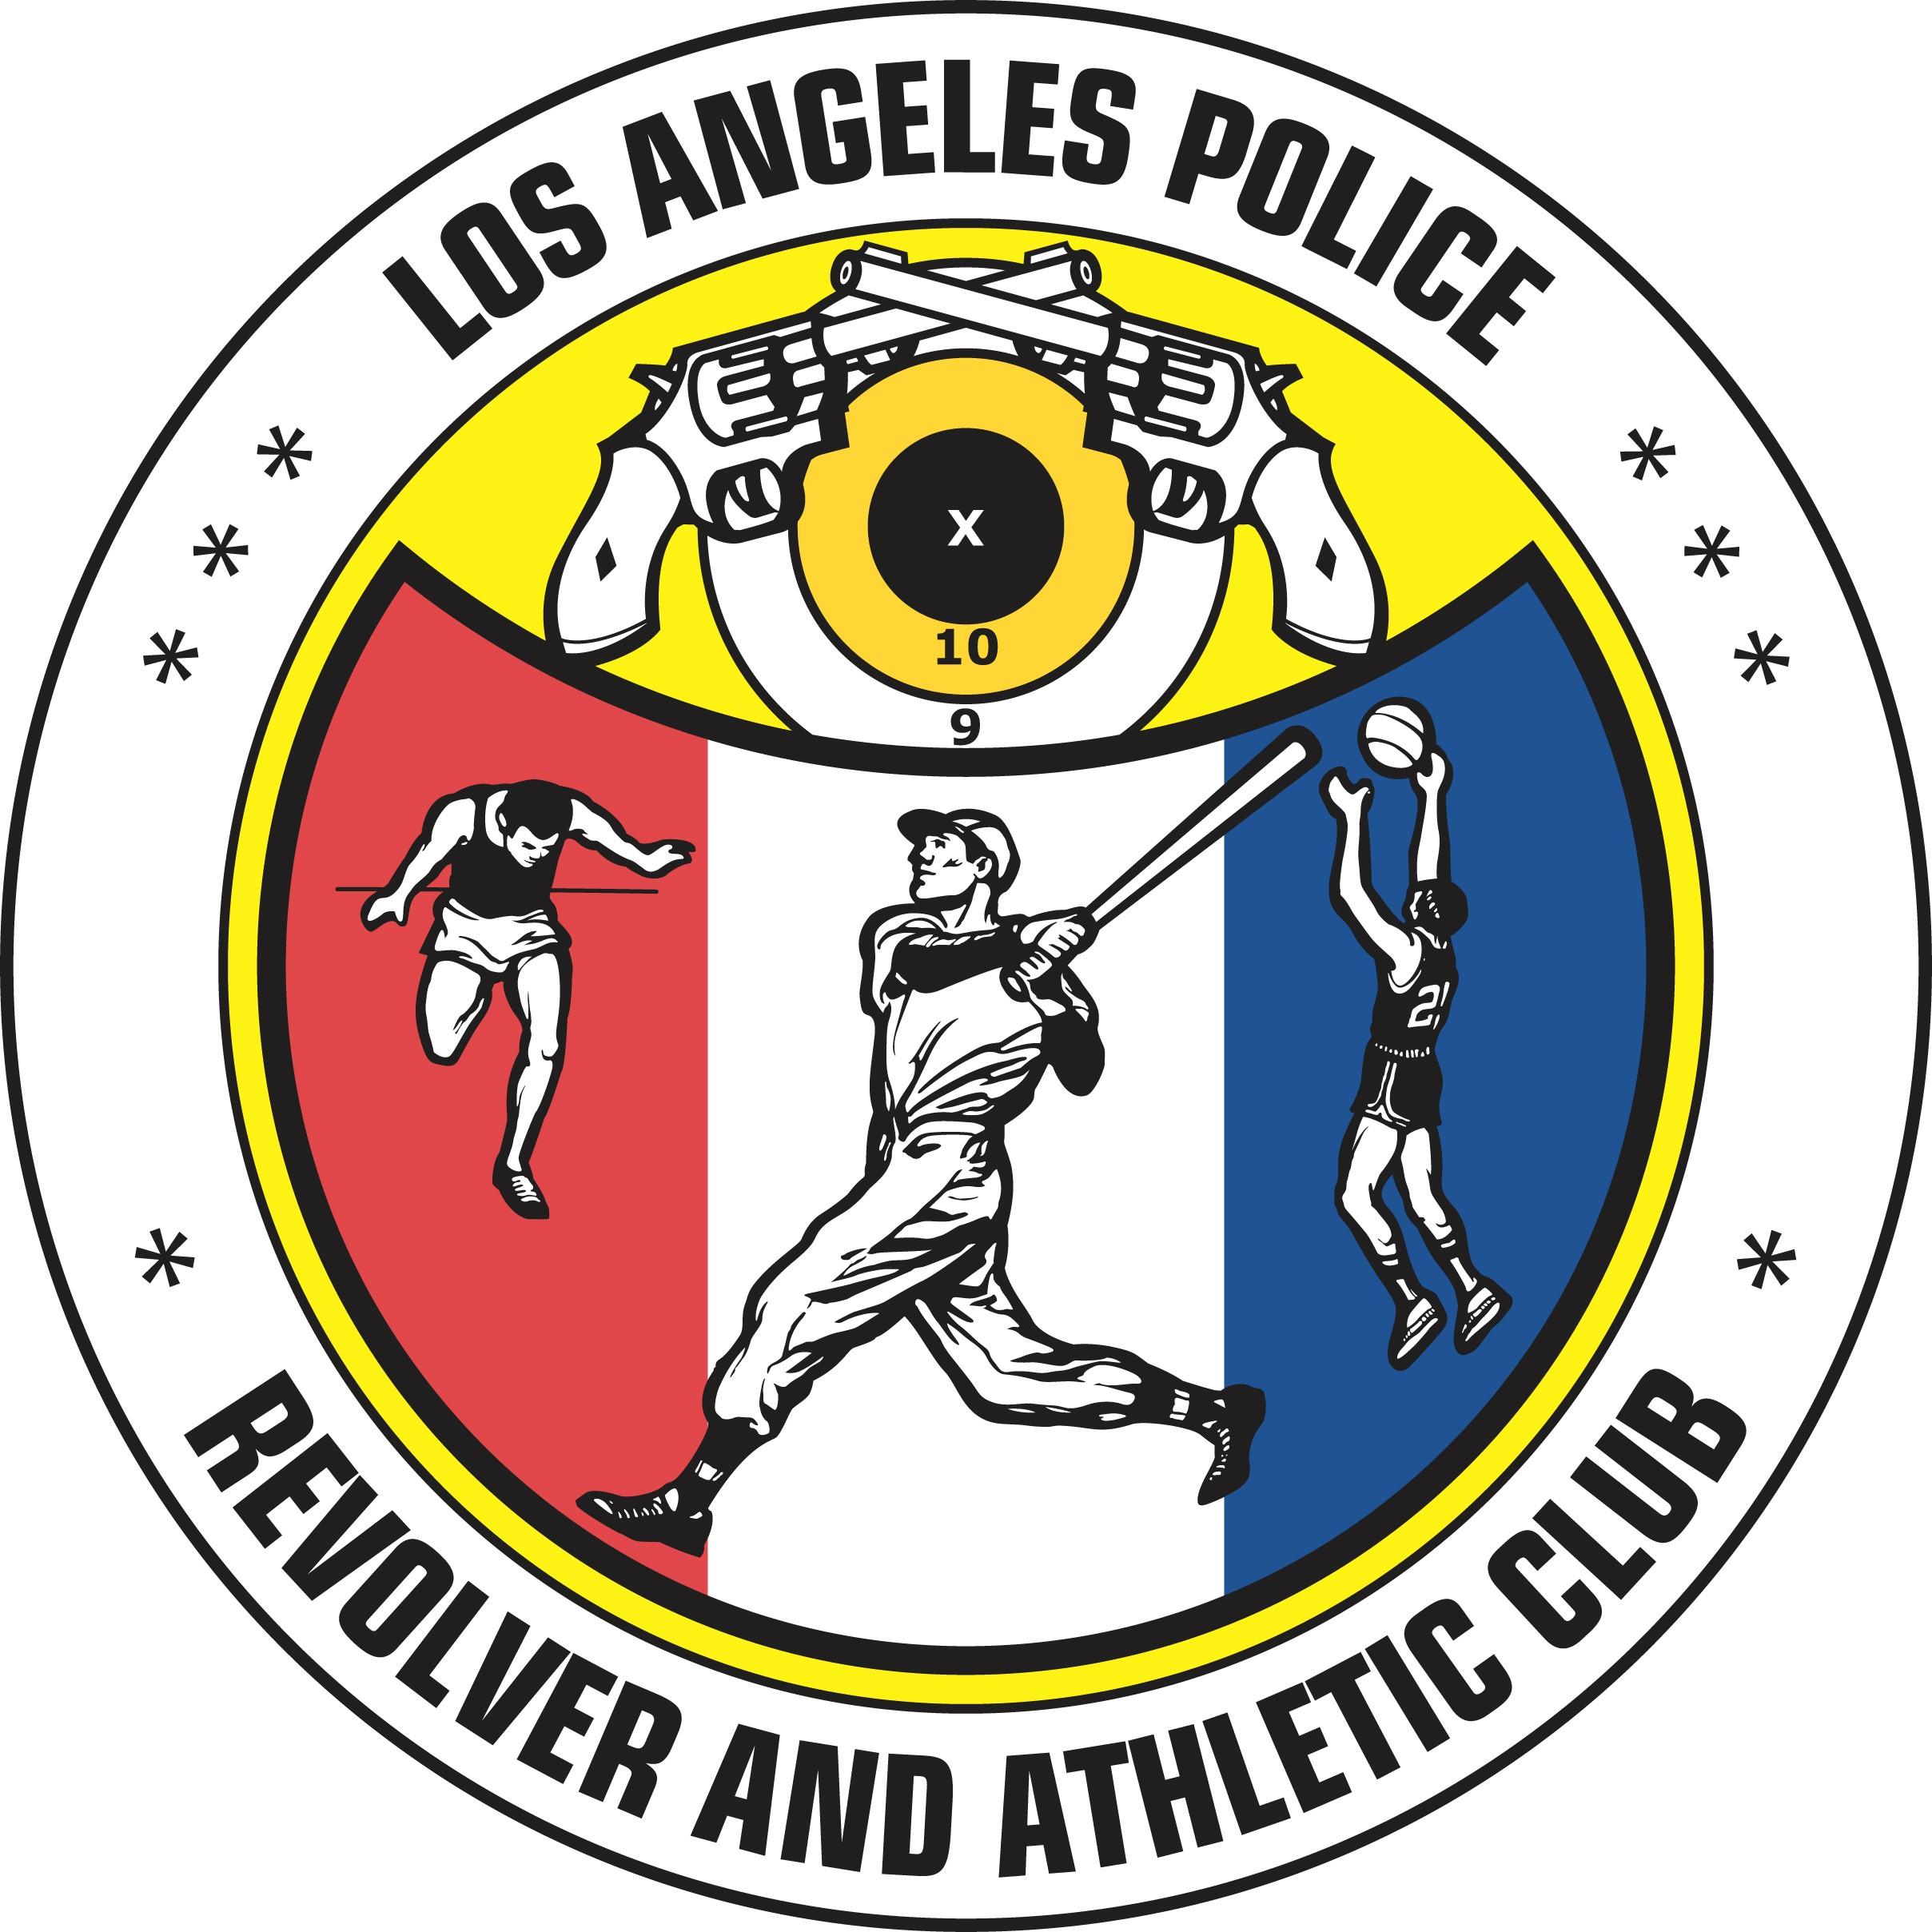 Los Angeles Police Revolver & Athletic Club | LinkedIn